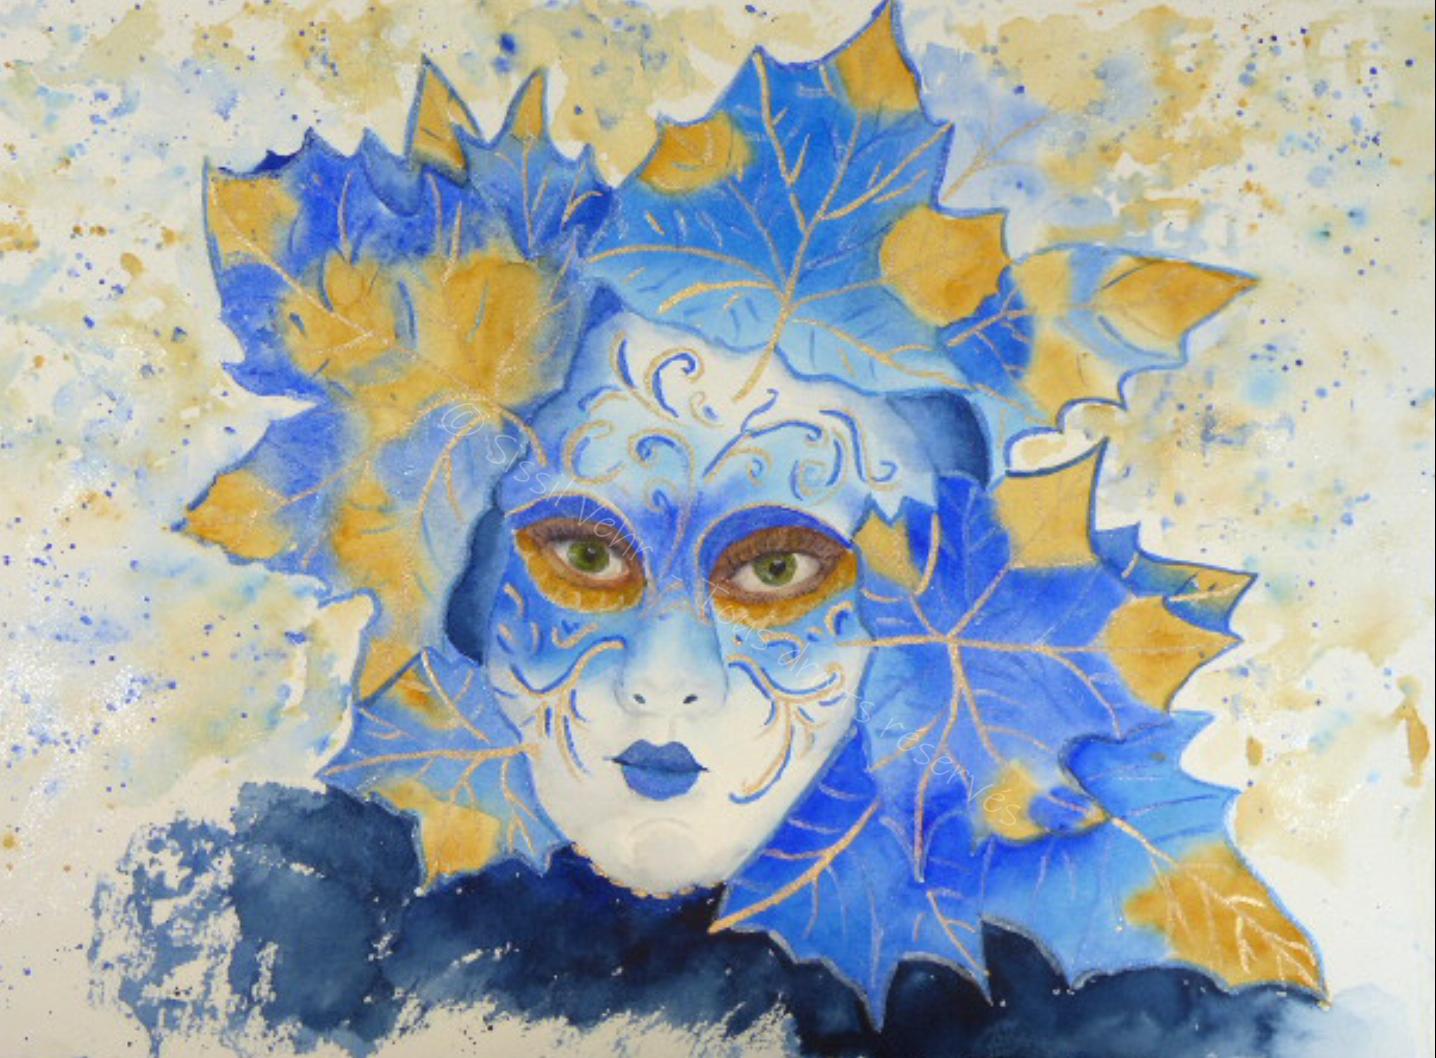 Aquarelle : Carnaval de Venise : masque bleu